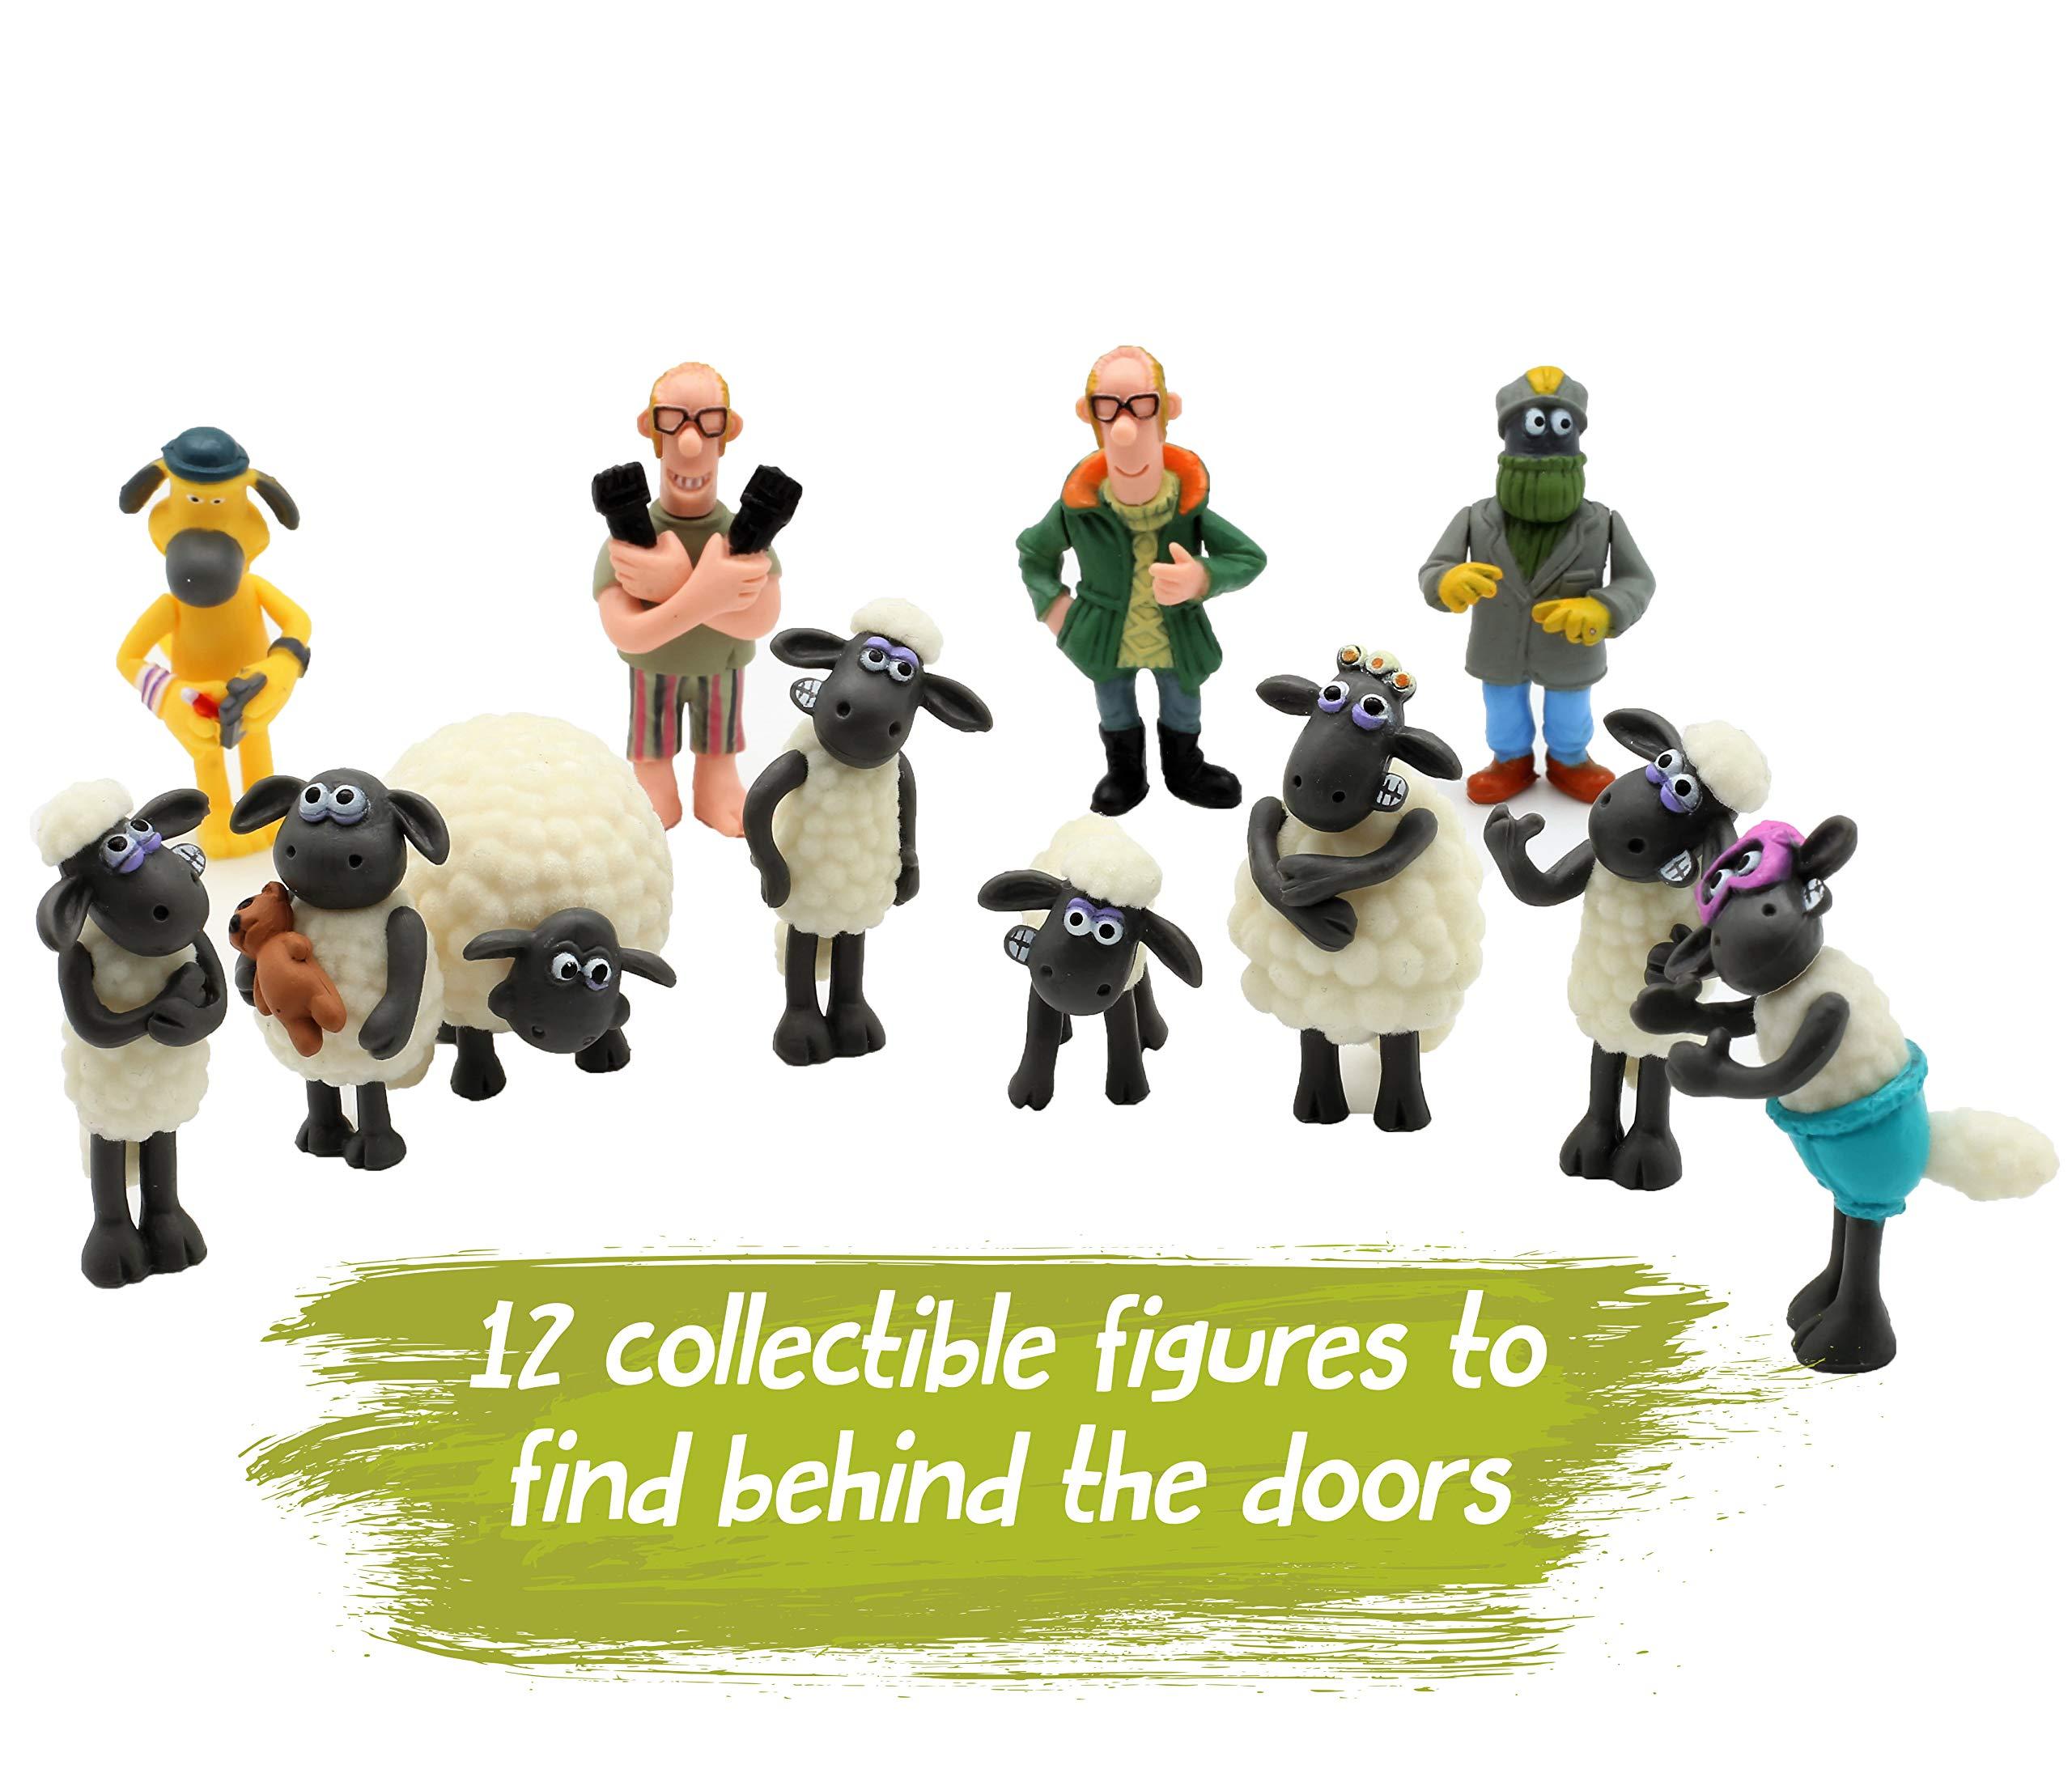 SHAUN THE SHEEP Calendario de Adviento para Niños Wallace and Gromit Dibujos Animados Incluye Pegatinas Figuritas Rompecabezas Juego de Mesa